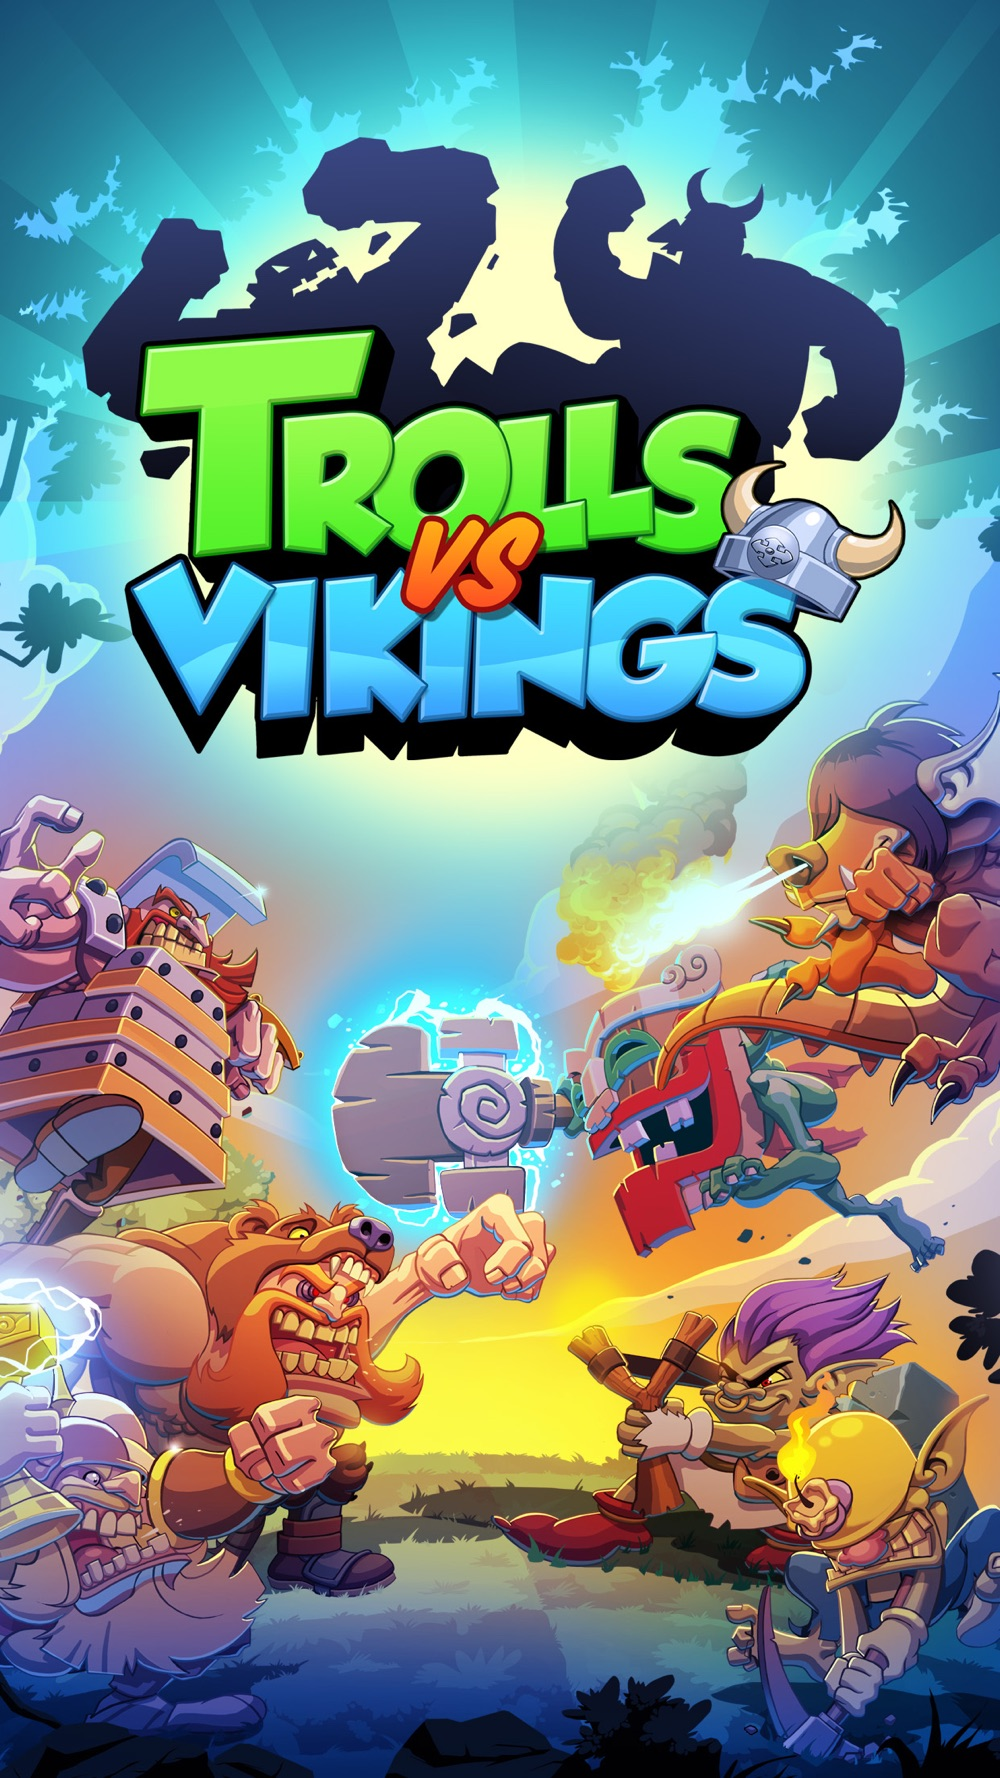 Trolls vs Vikings Cheat Codes